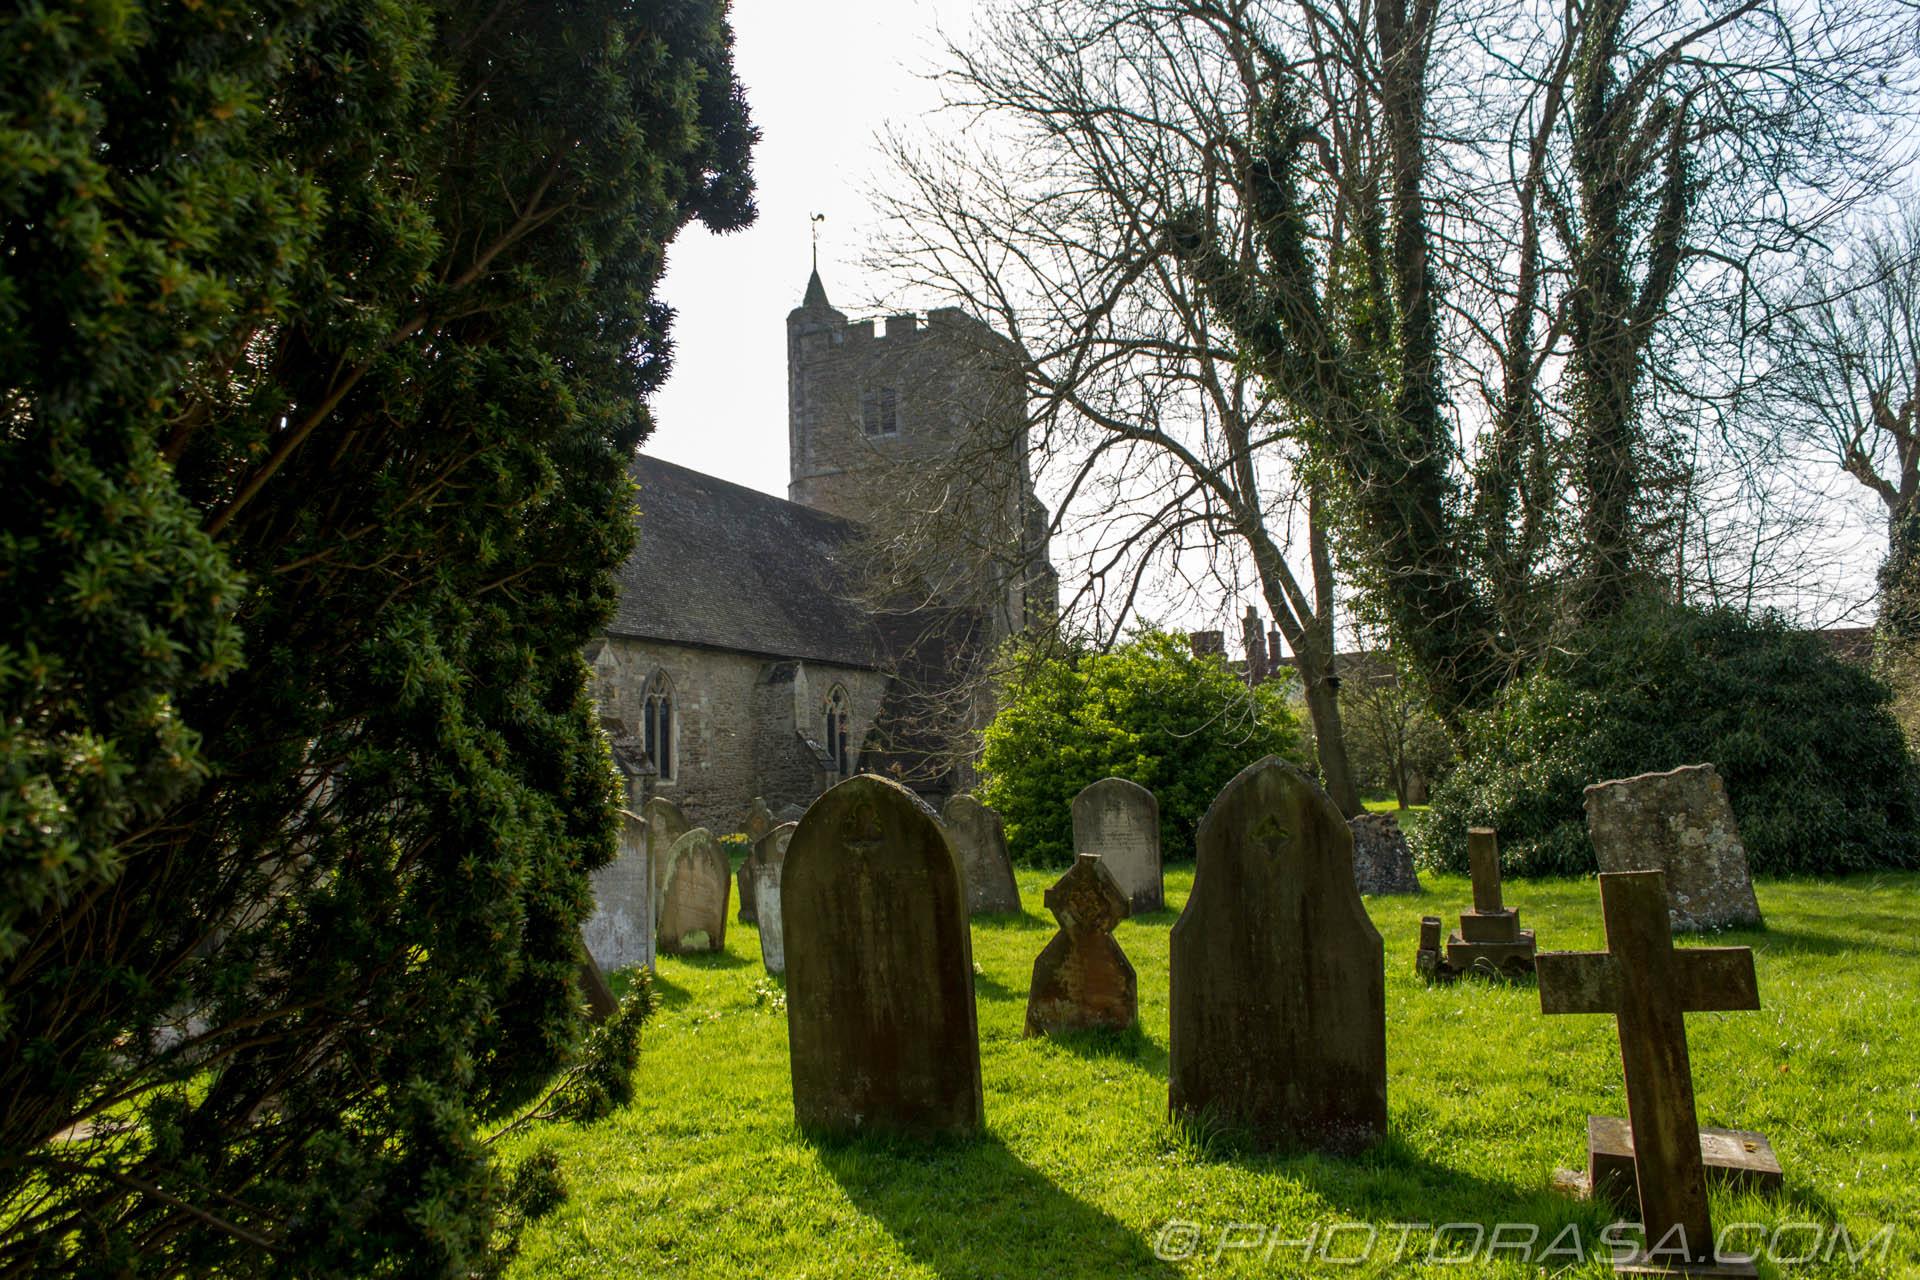 https://photorasa.com/saints-church-staplehurst-kent/graves-and-staplehurst-church/